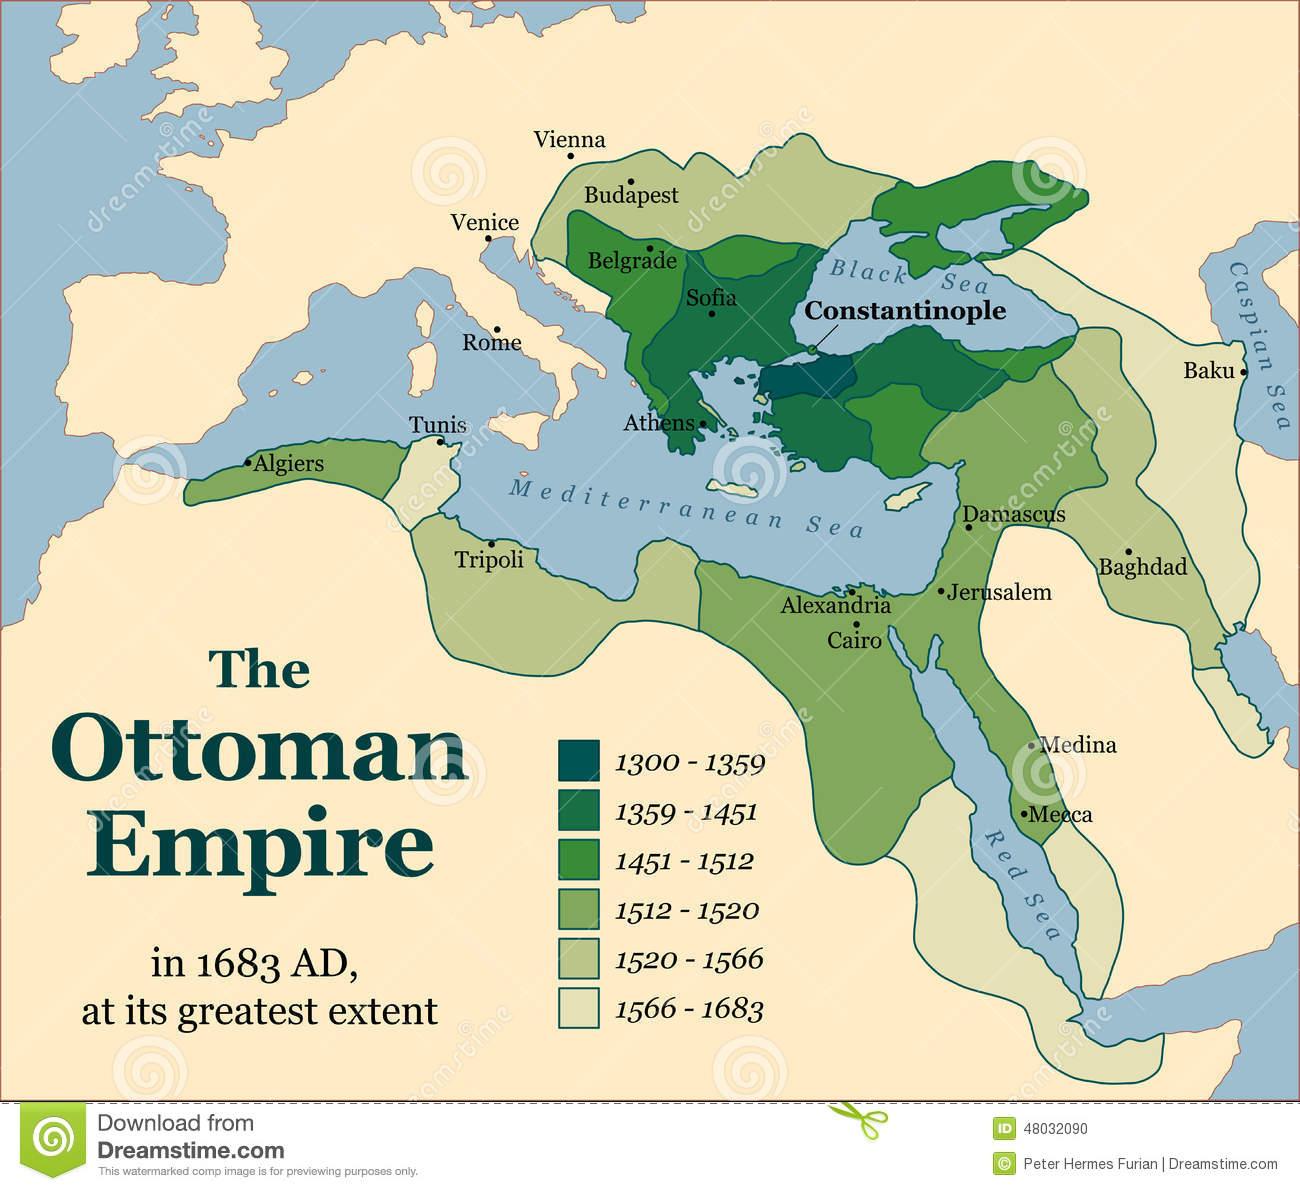 HD Quality Wallpaper | Collection: Artistic, 1300x1191 Ottoman Empire